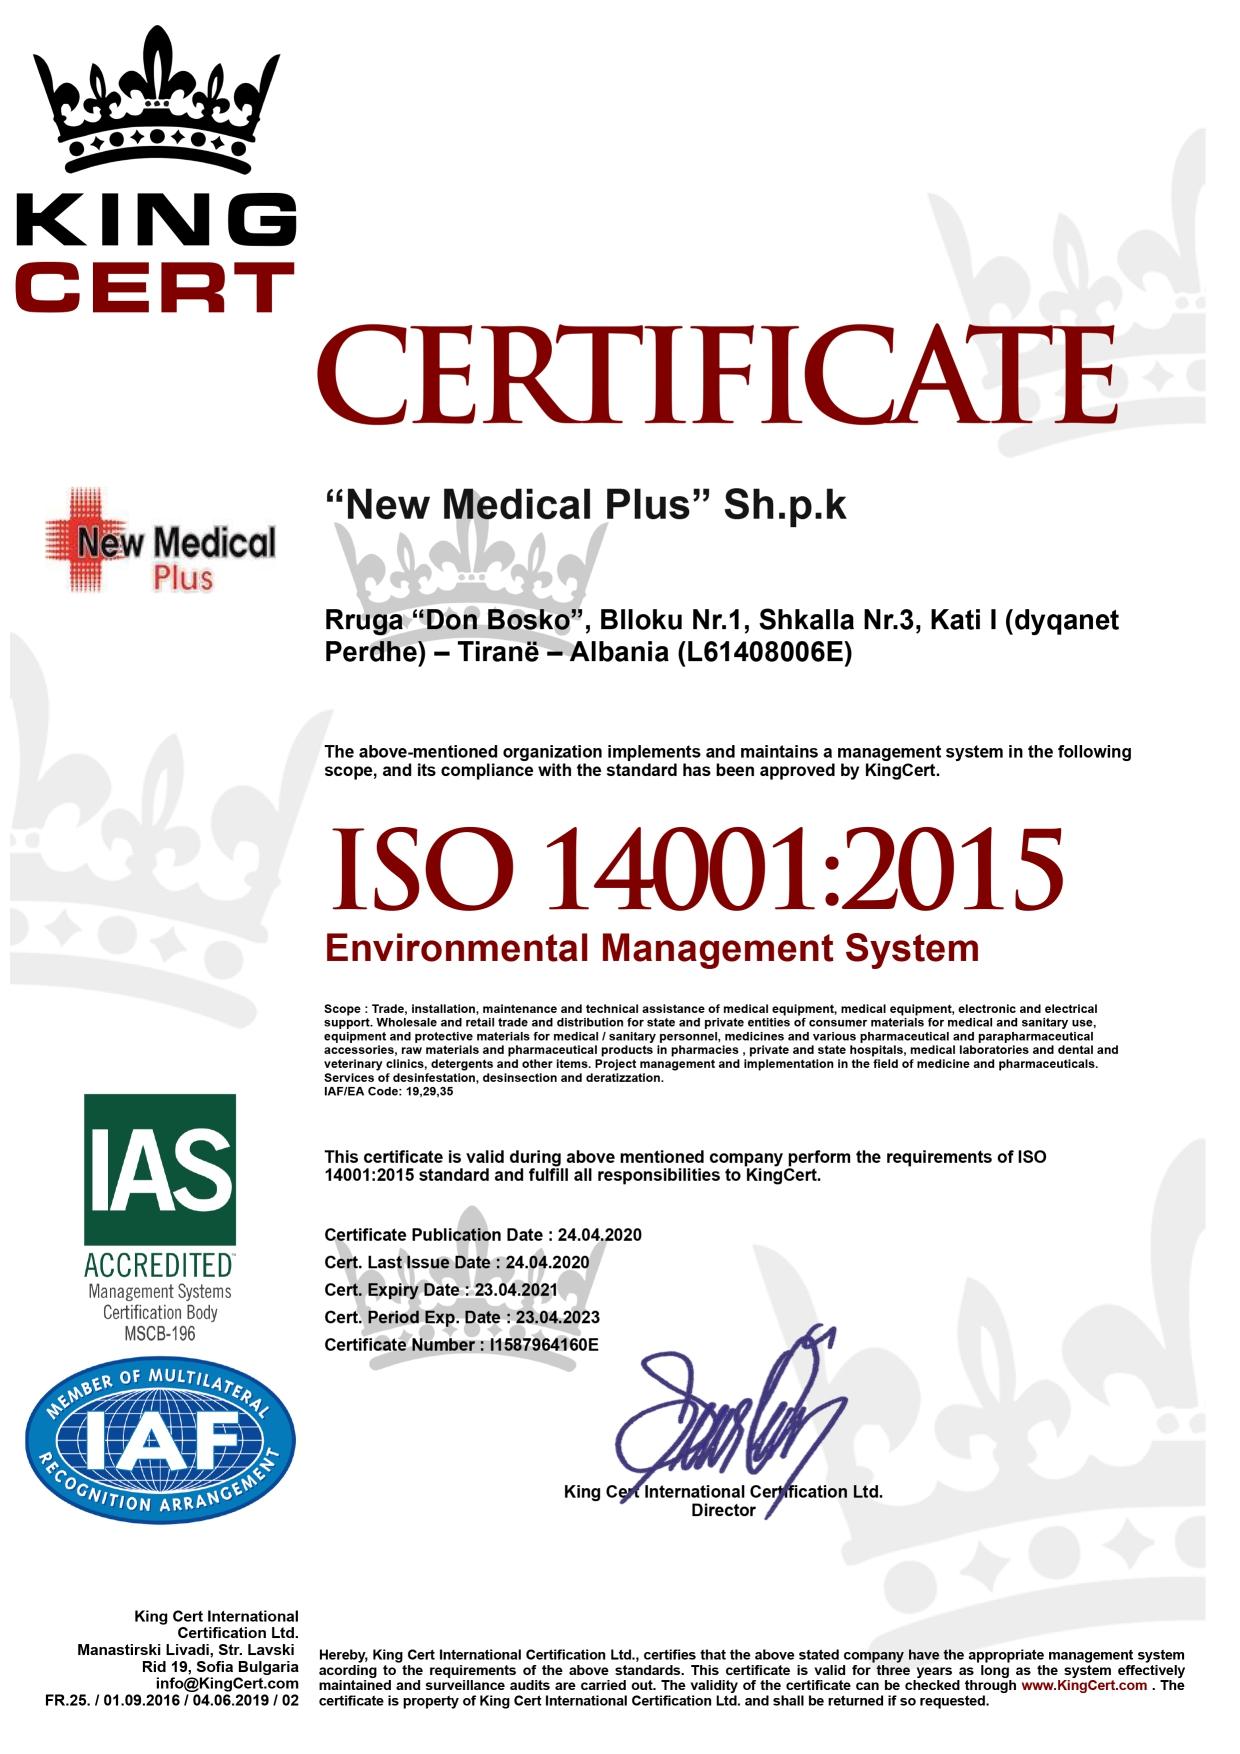 NEW MEDICAL PLUS WEBSITE CERTIFIKATA 8